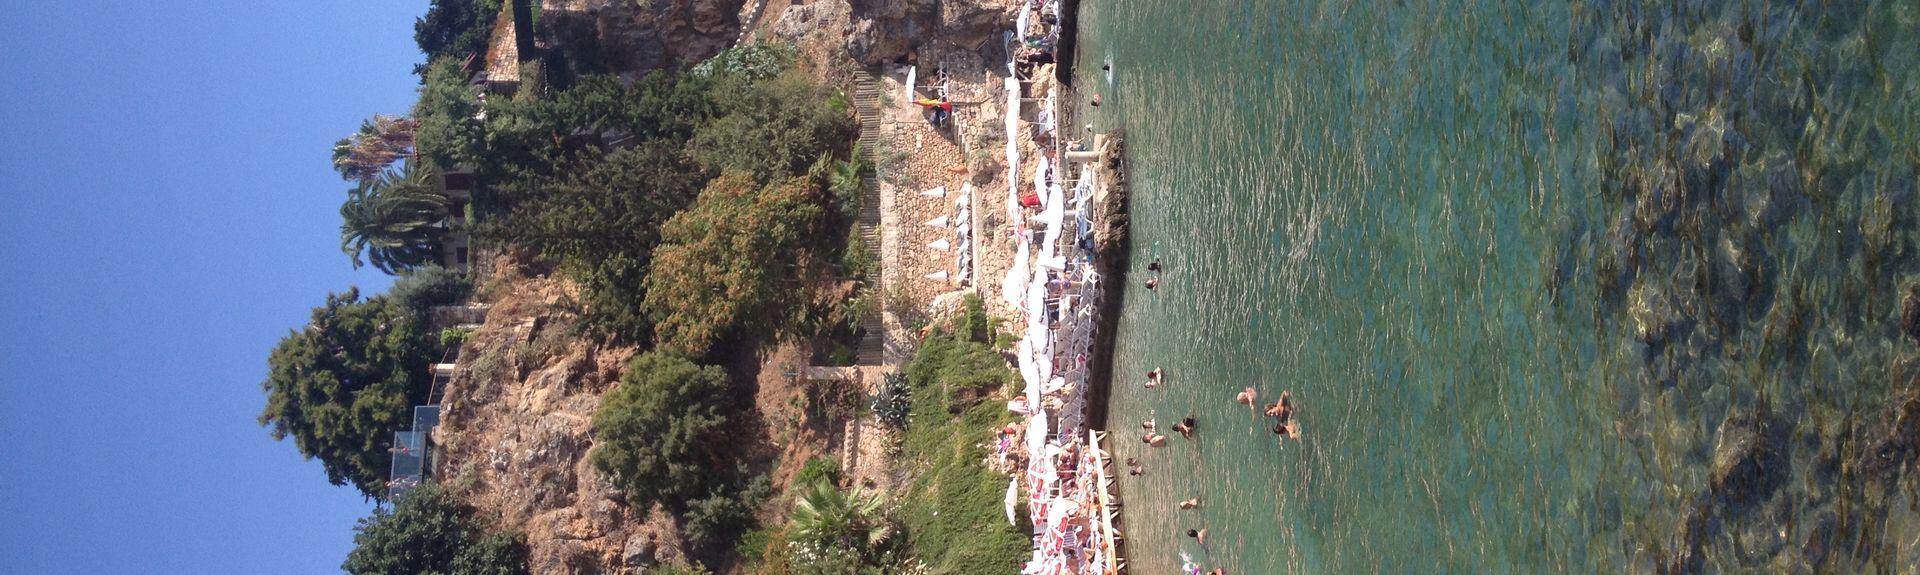 Praia Cirali, Kemer, Antália (região), Turquia